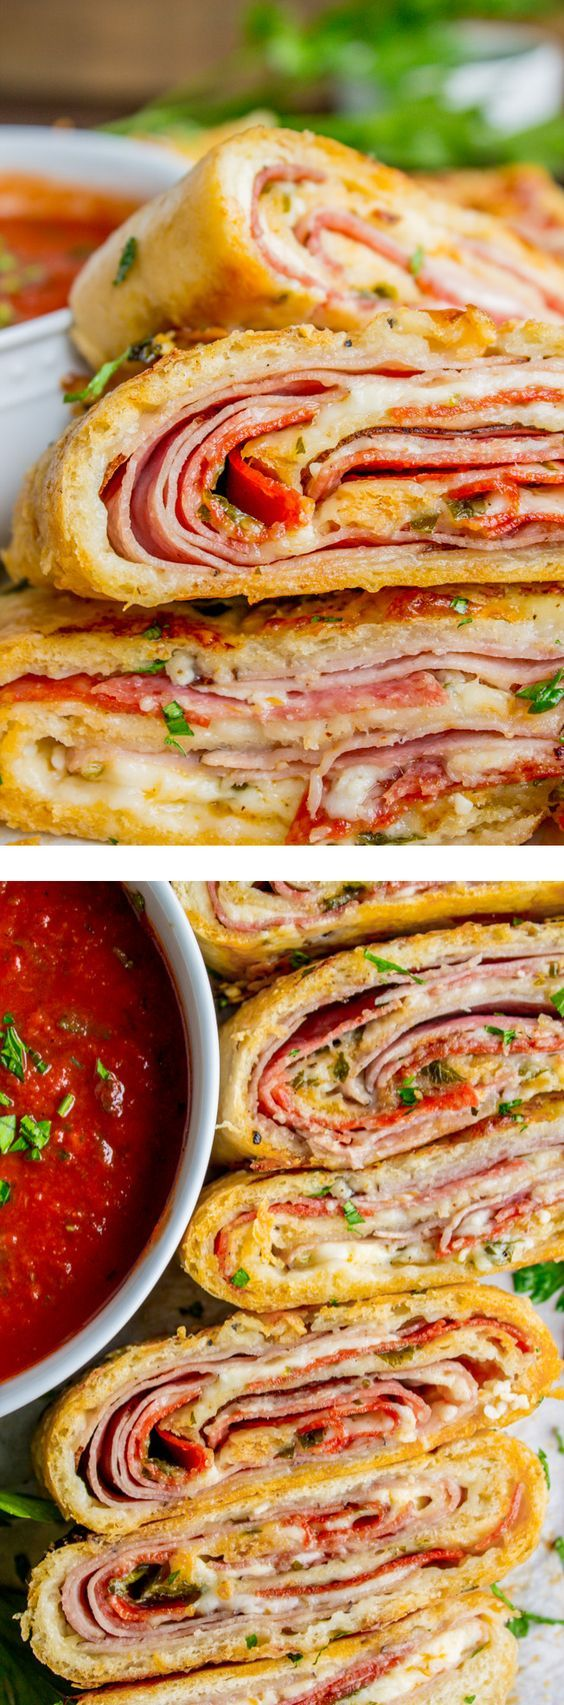 Classic Stromboli Recipe (Easy Dinner or Quick Appetizer!)